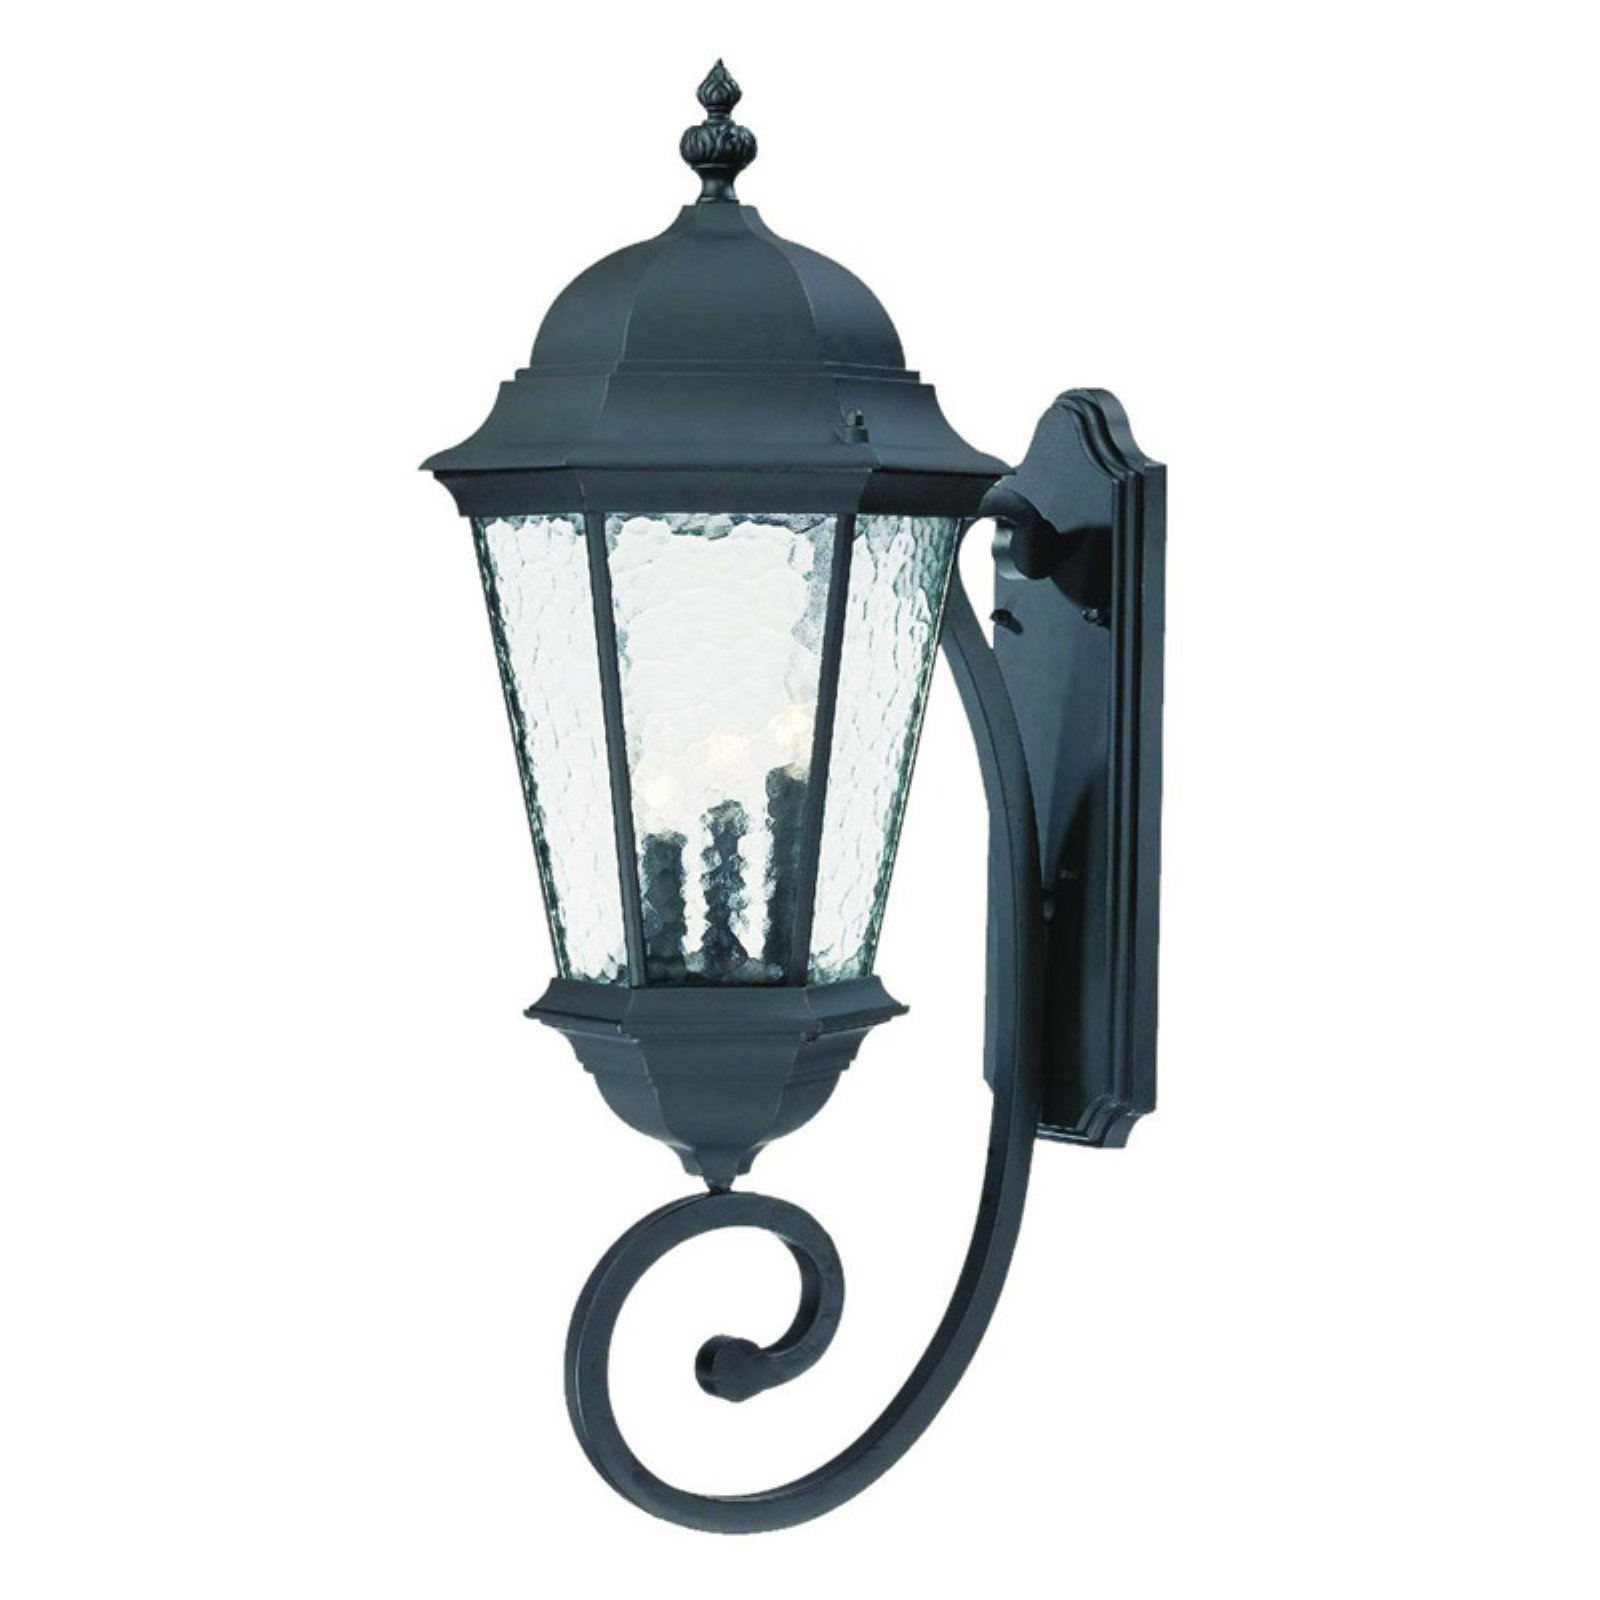 Acclaim Lighting Telfair 3 Light Outdoor Wall Mount Light Fixture